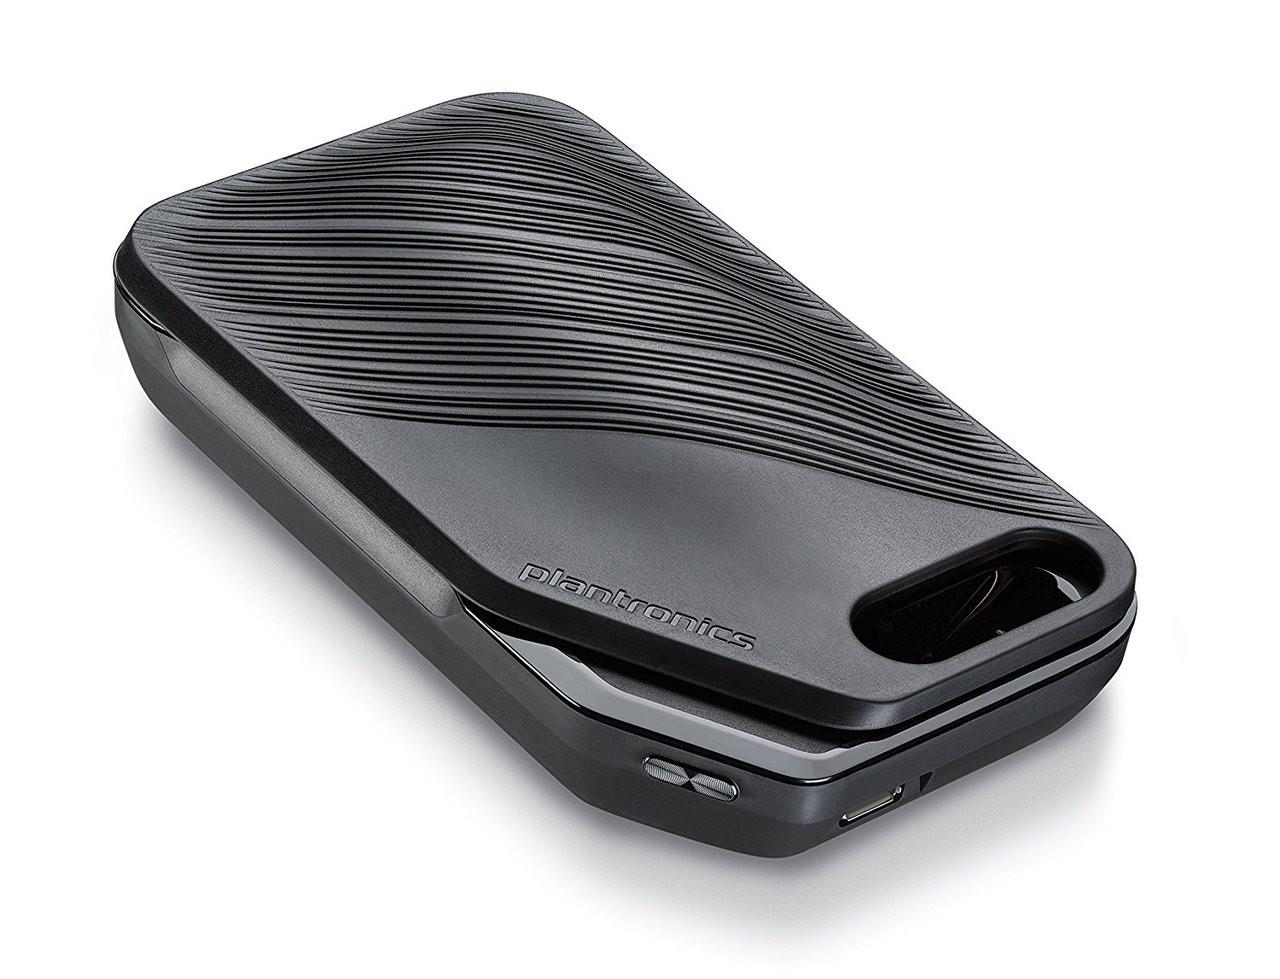 Plantronics Voyager 5200 Portable Power Charging Case Black